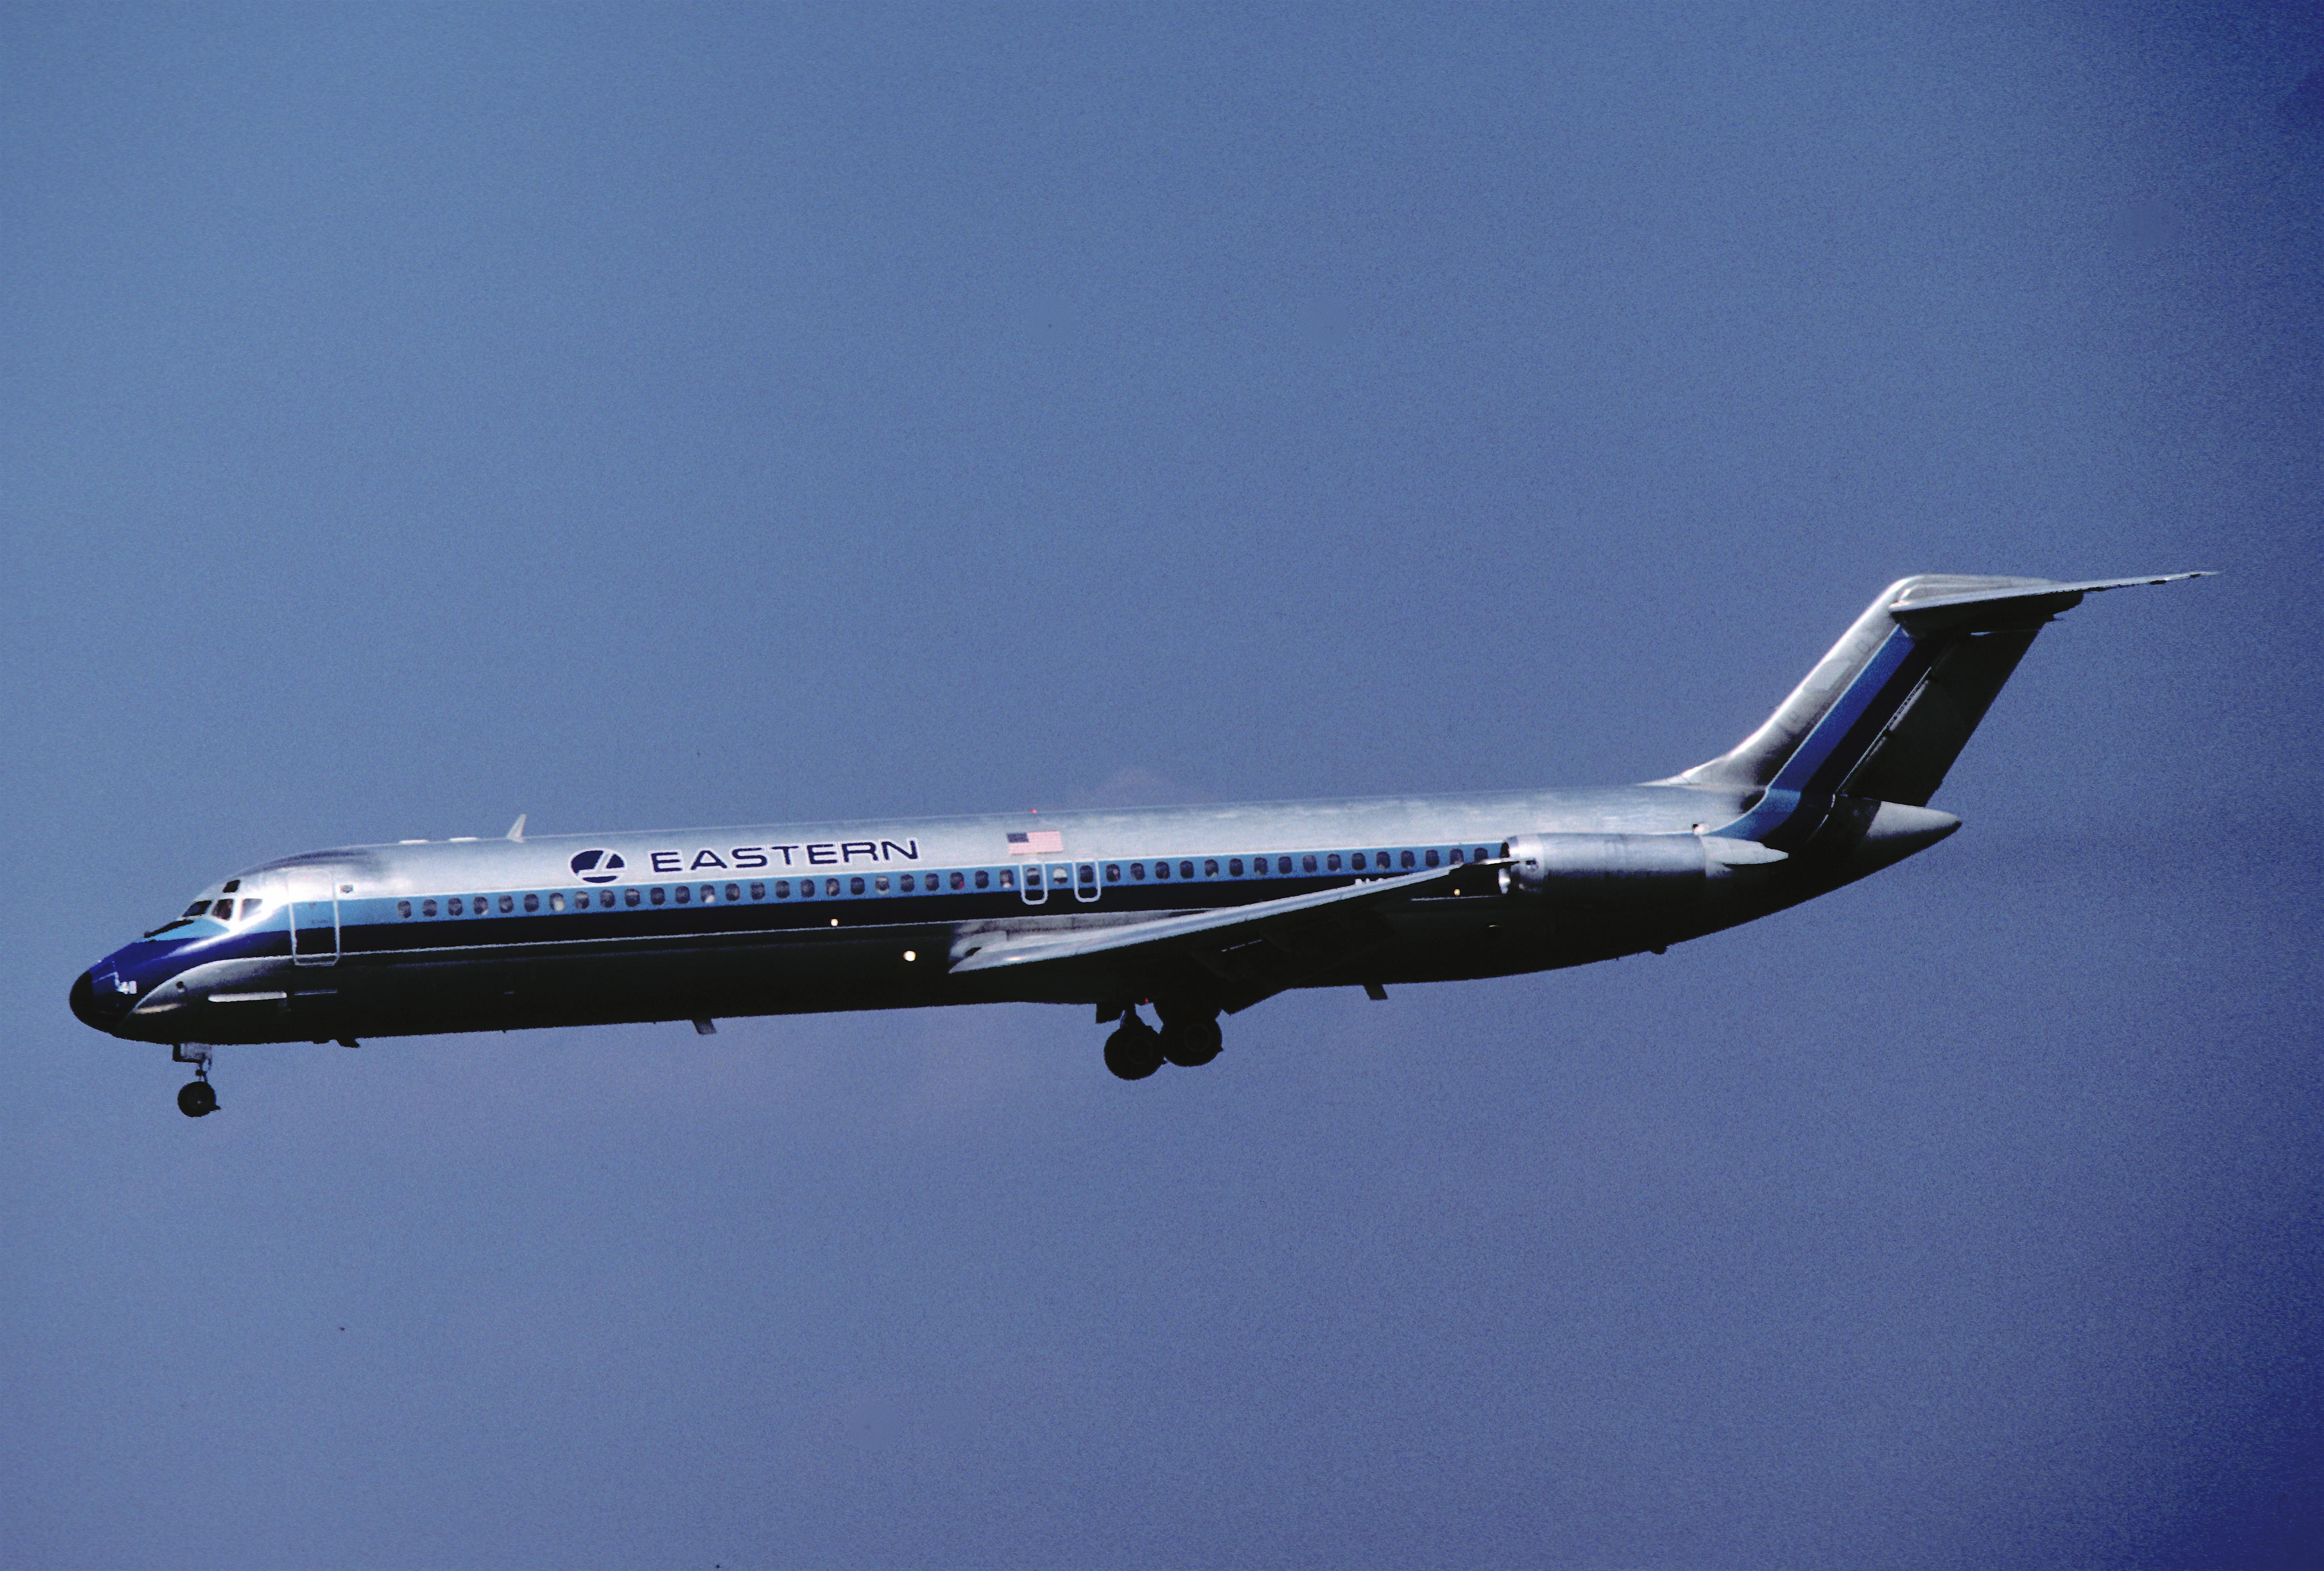 Eastern_Airlines_DC-9-51;_N411EA@LGA,_Ju